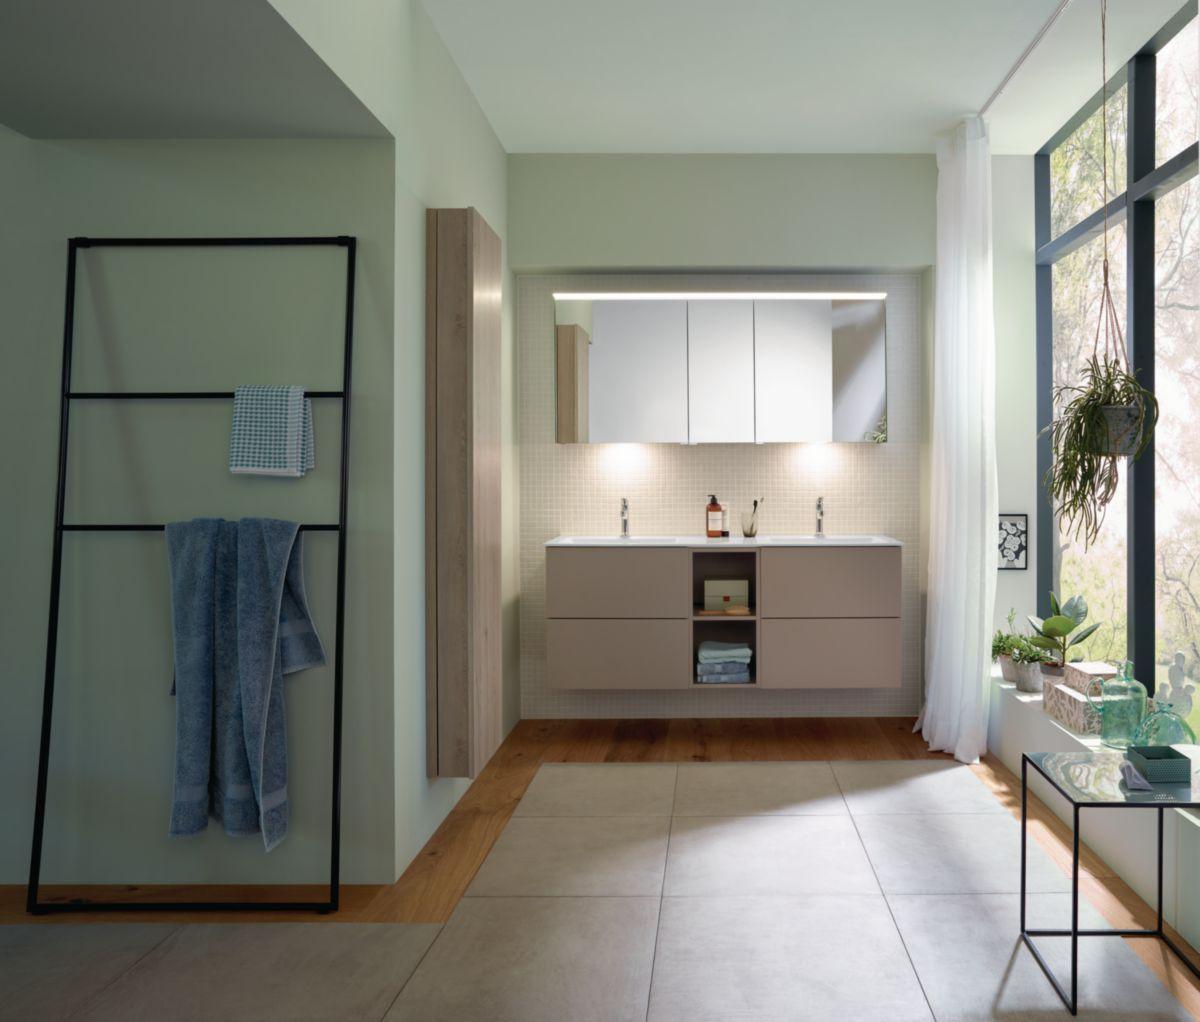 Meuble salle de bain free roseau mat 150 cm envie de Meuble salle de bain 150